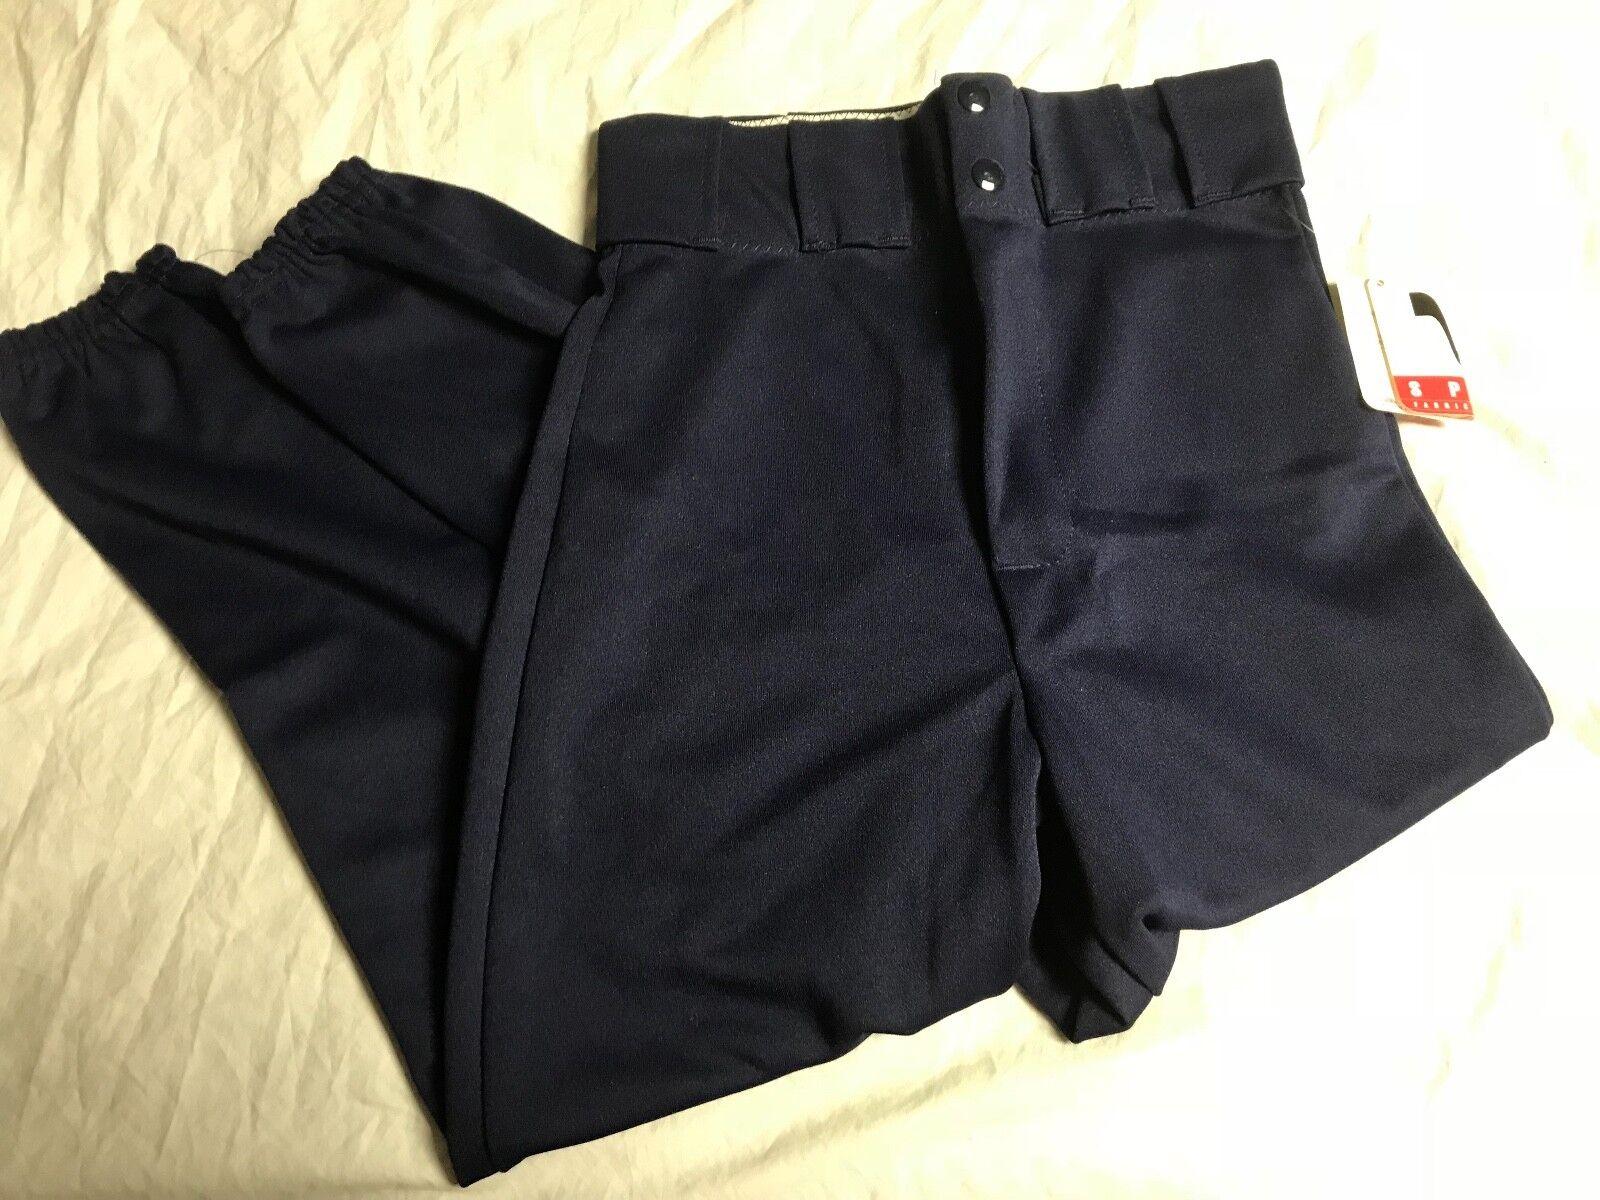 LOT of 27 Pair Visa Sports Latrell Adult Softball Pants Navy Multiple Größes NEW